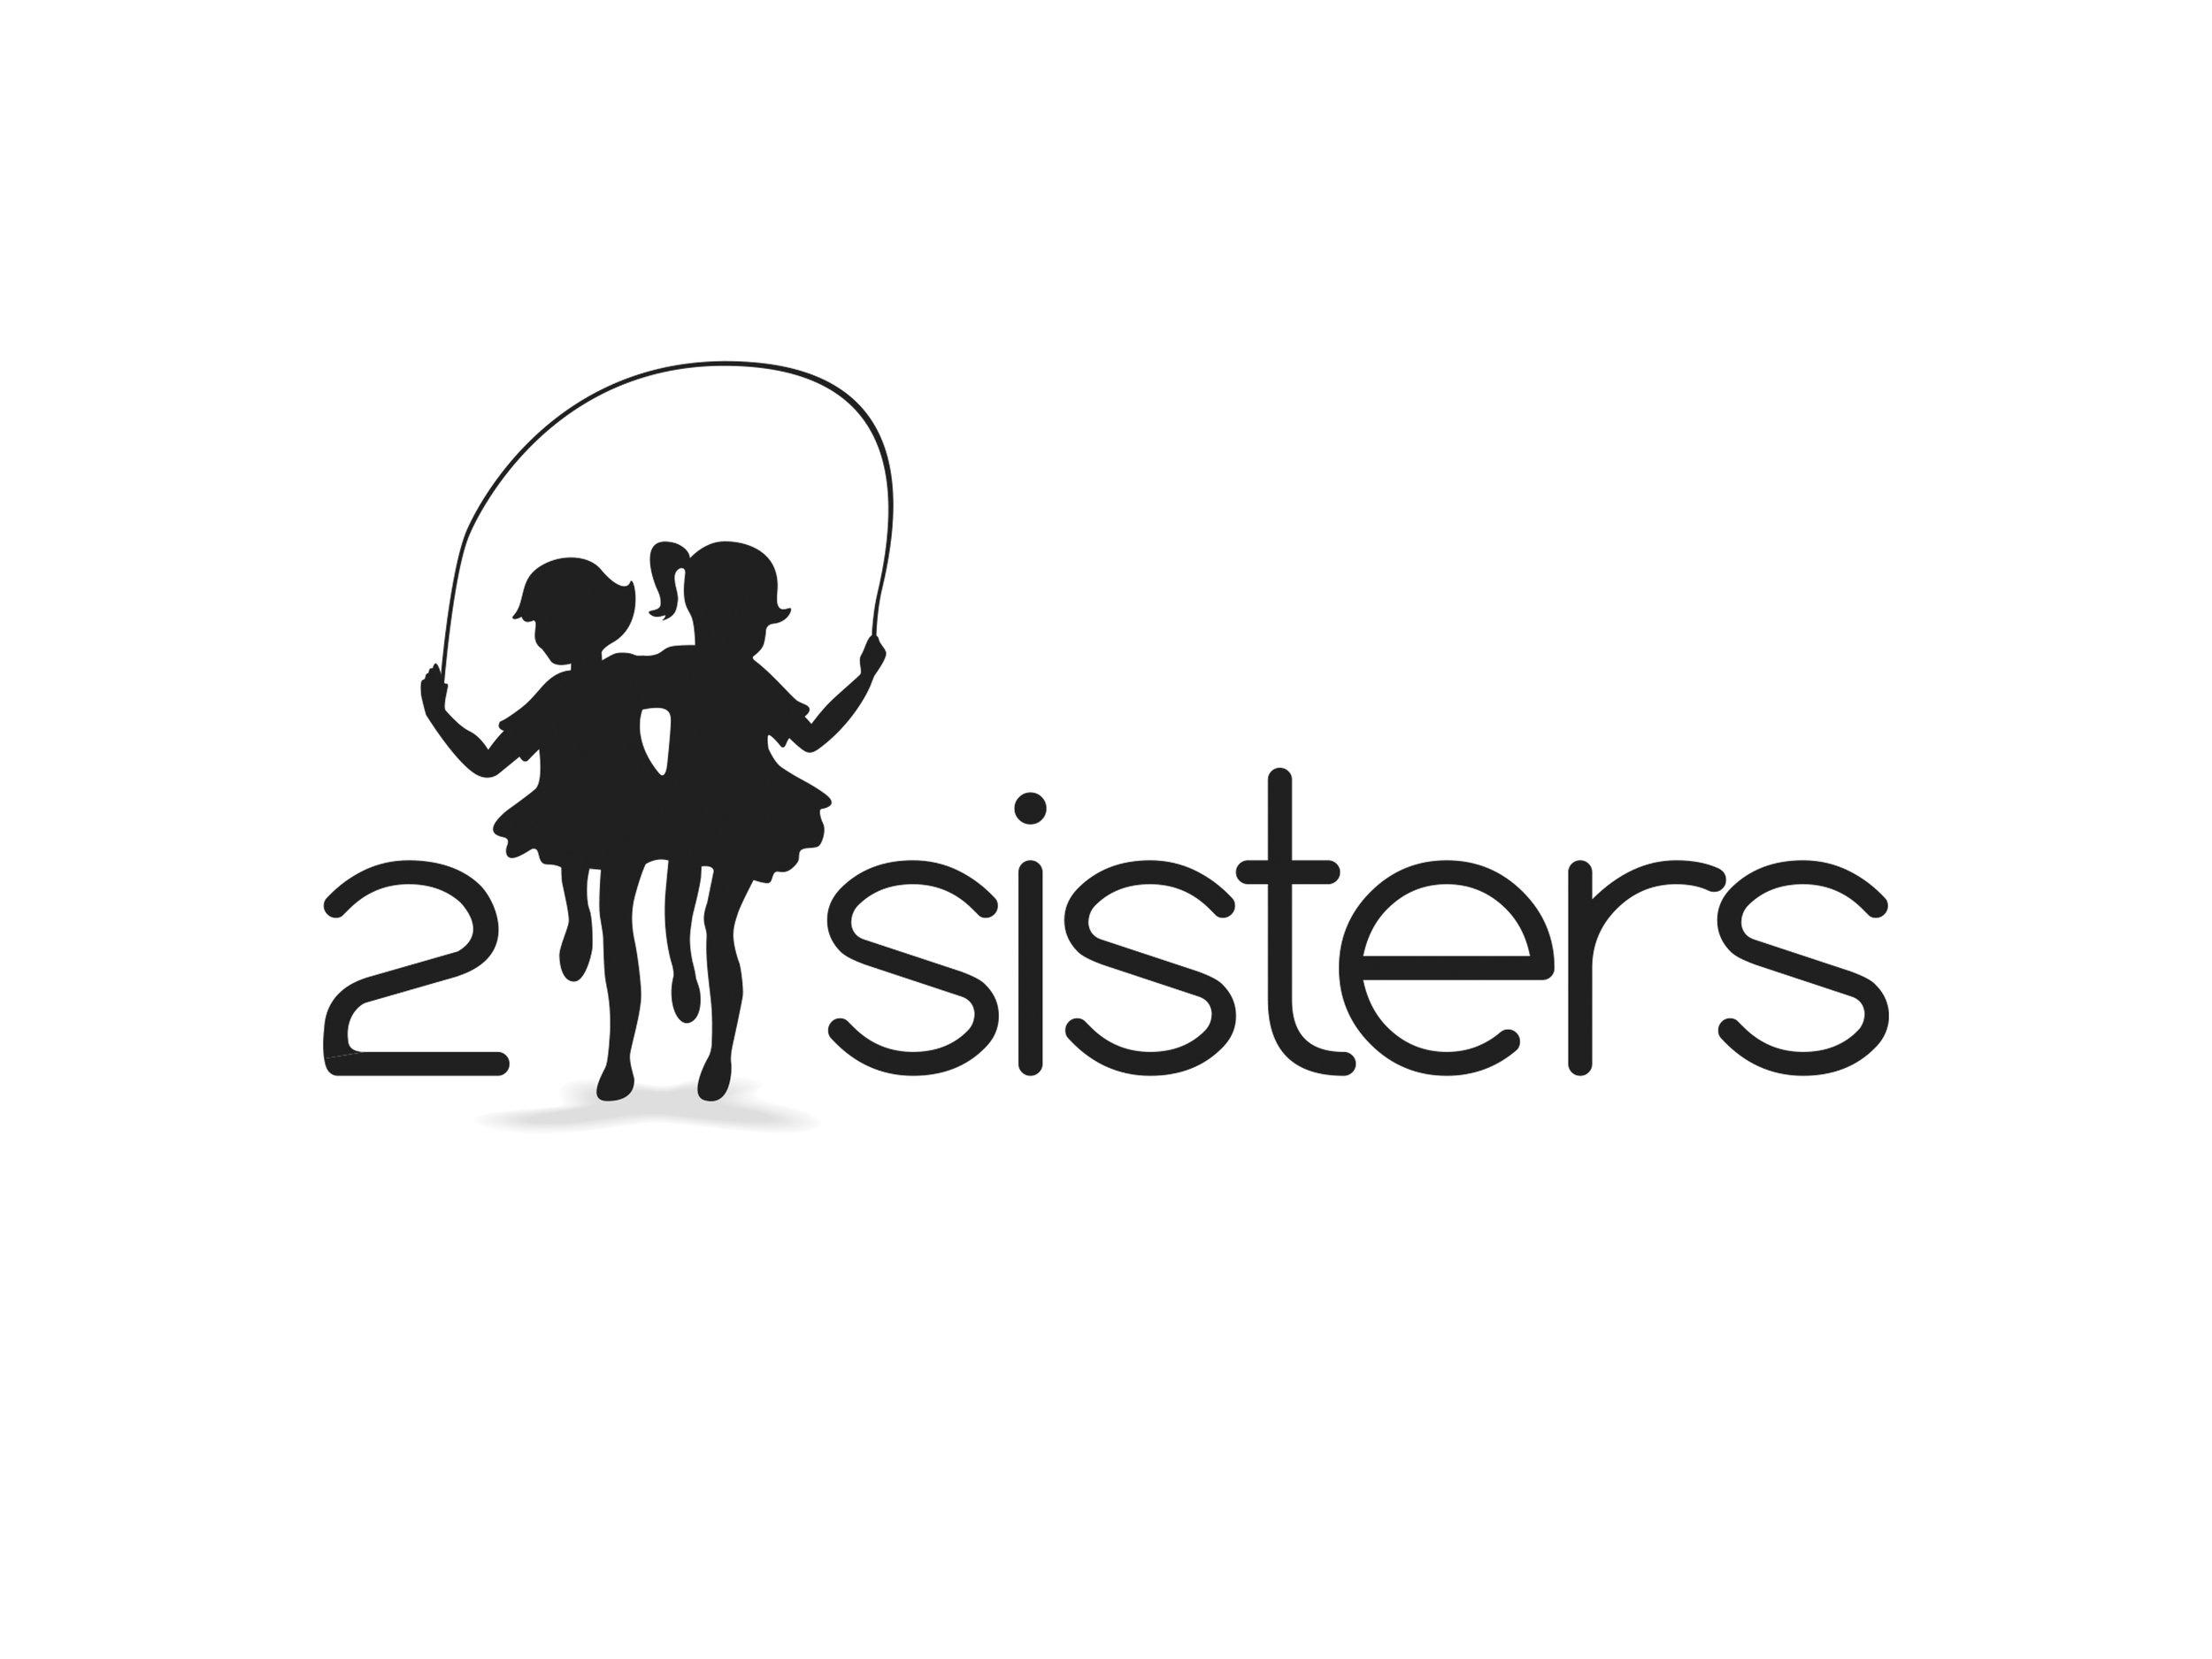 Whoville 2Sisters Logo.jpg